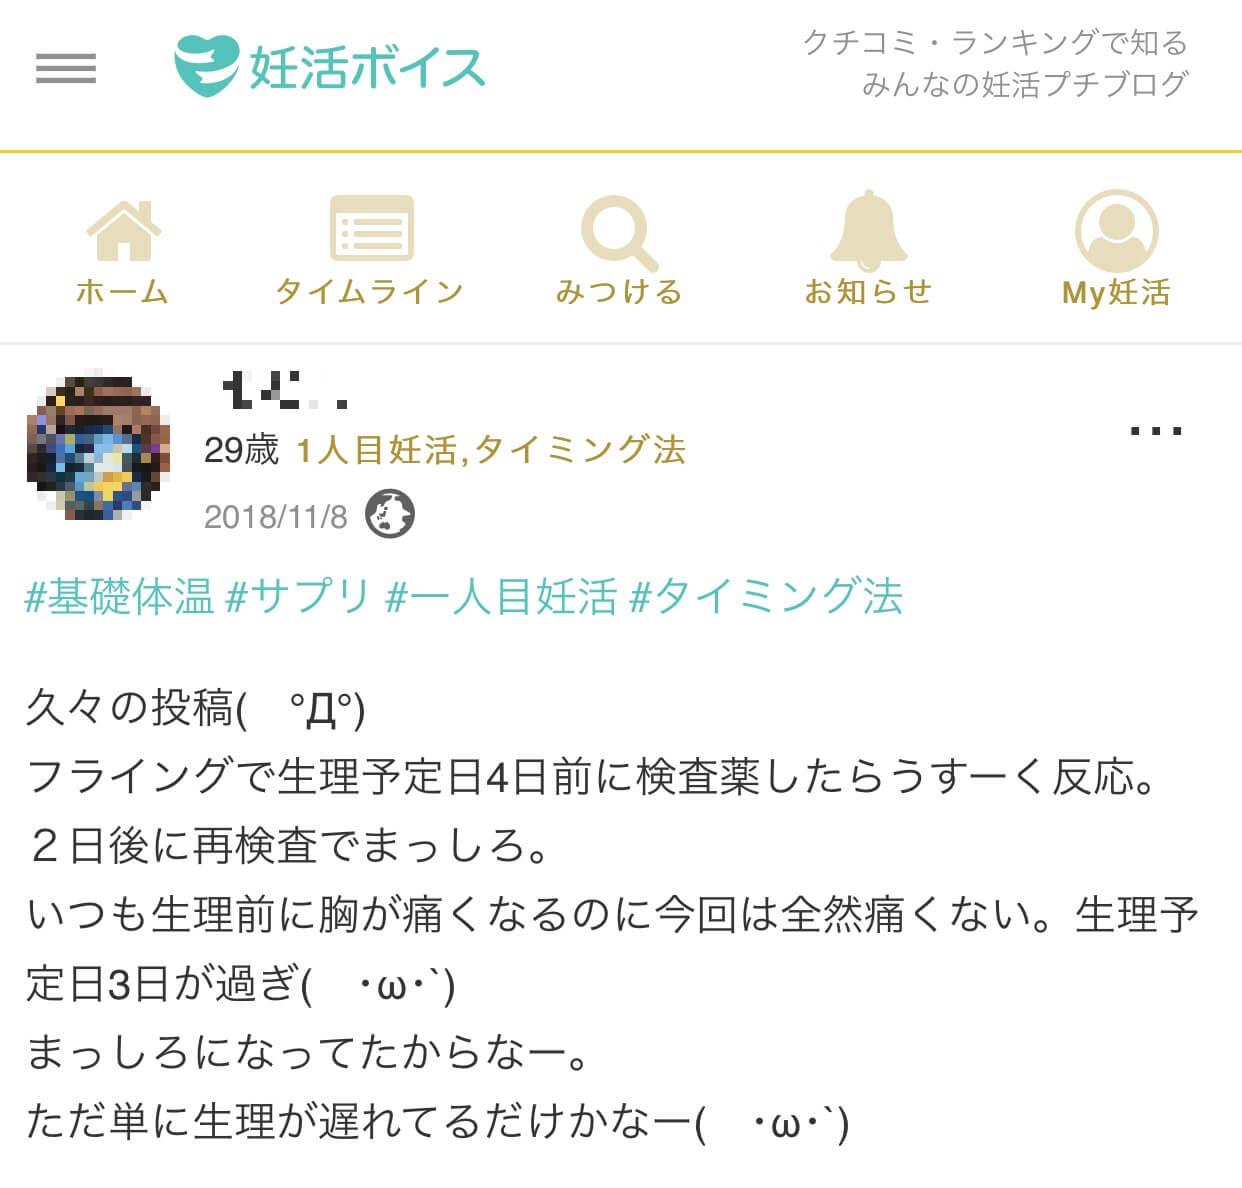 Paさん(29歳・1人目妊活・タイミング法)